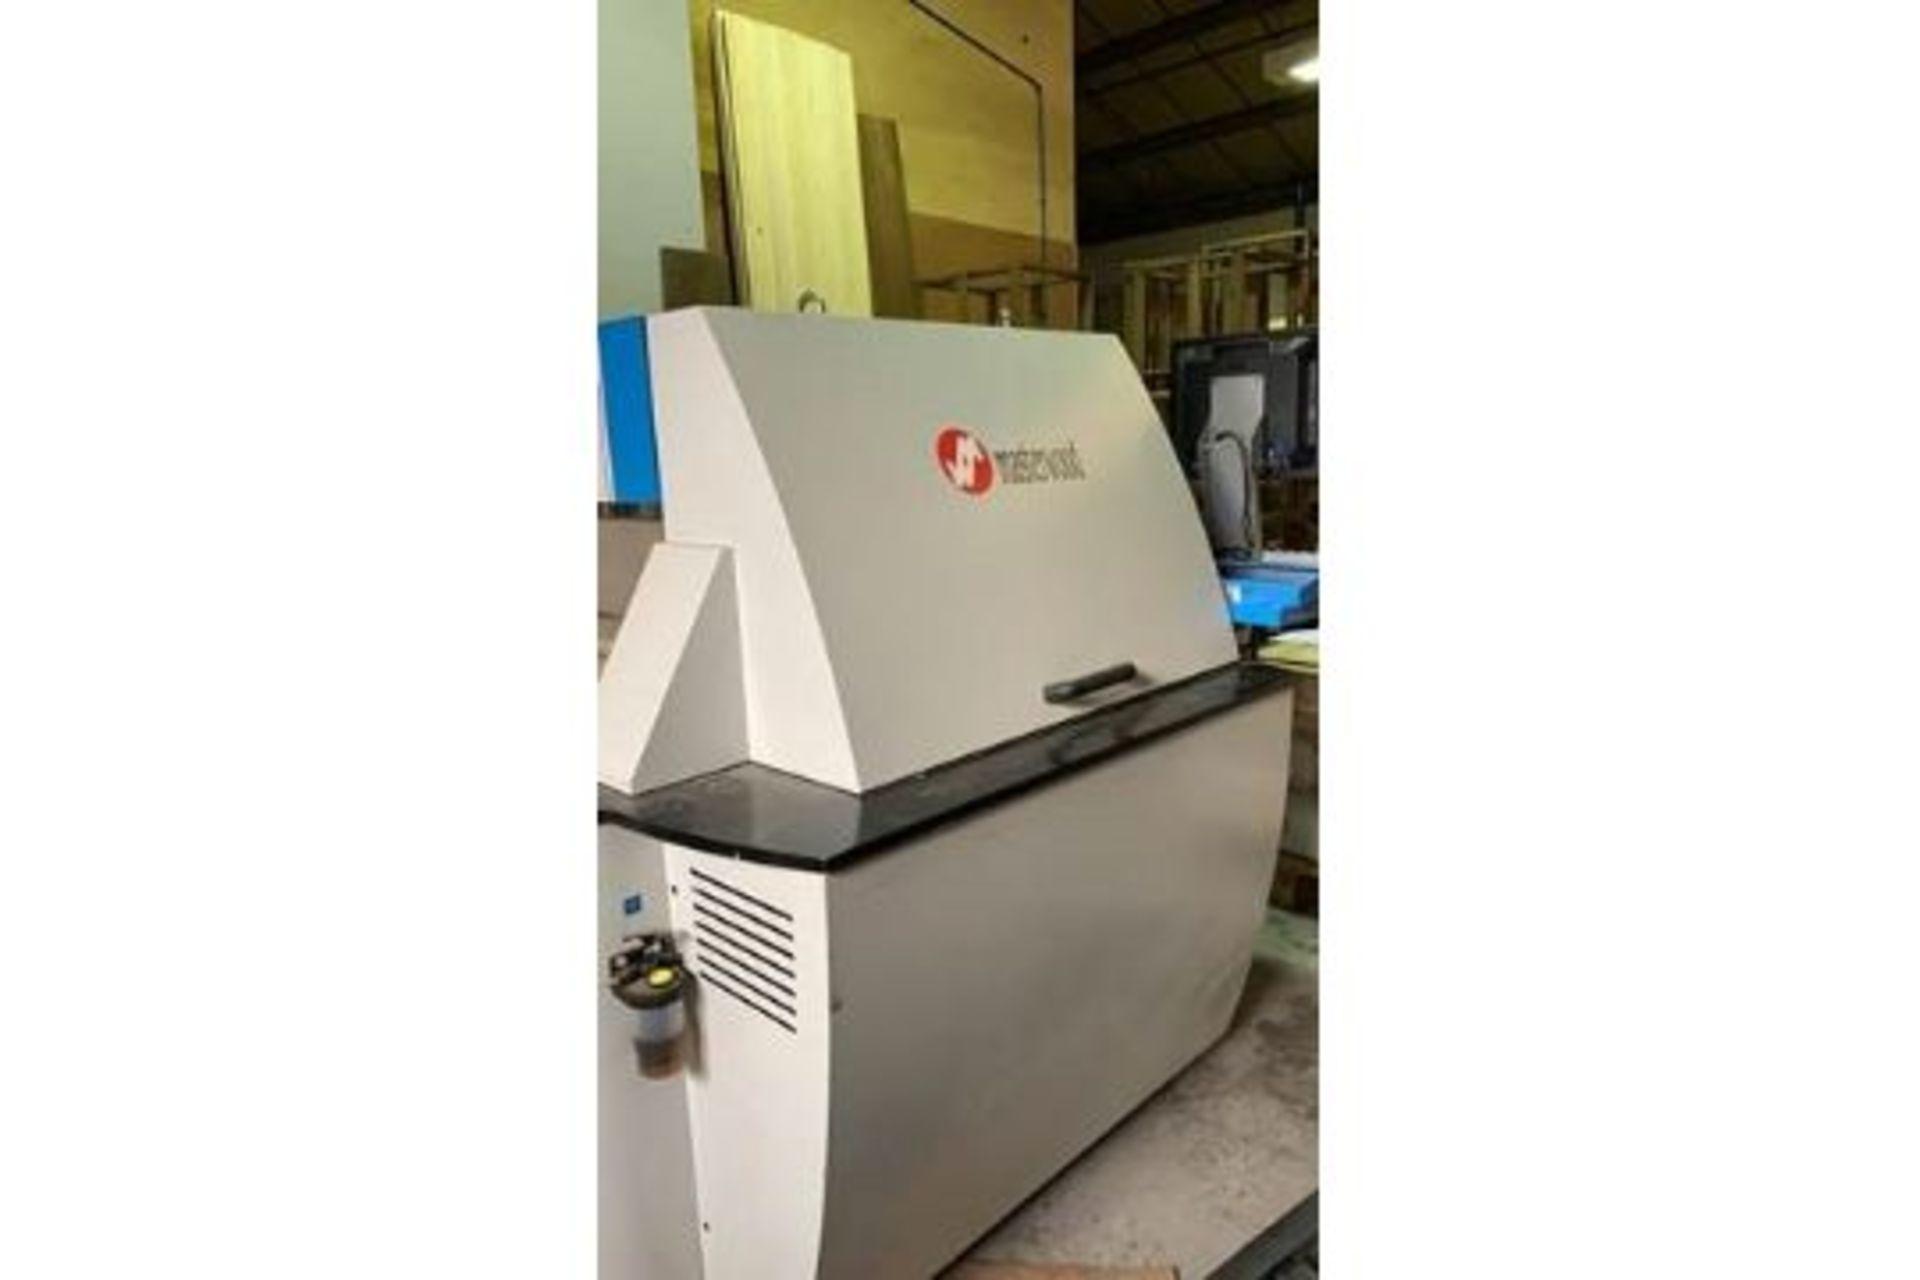 2010 Masterwood Project TF100 CNC Machine Centre - Image 5 of 7